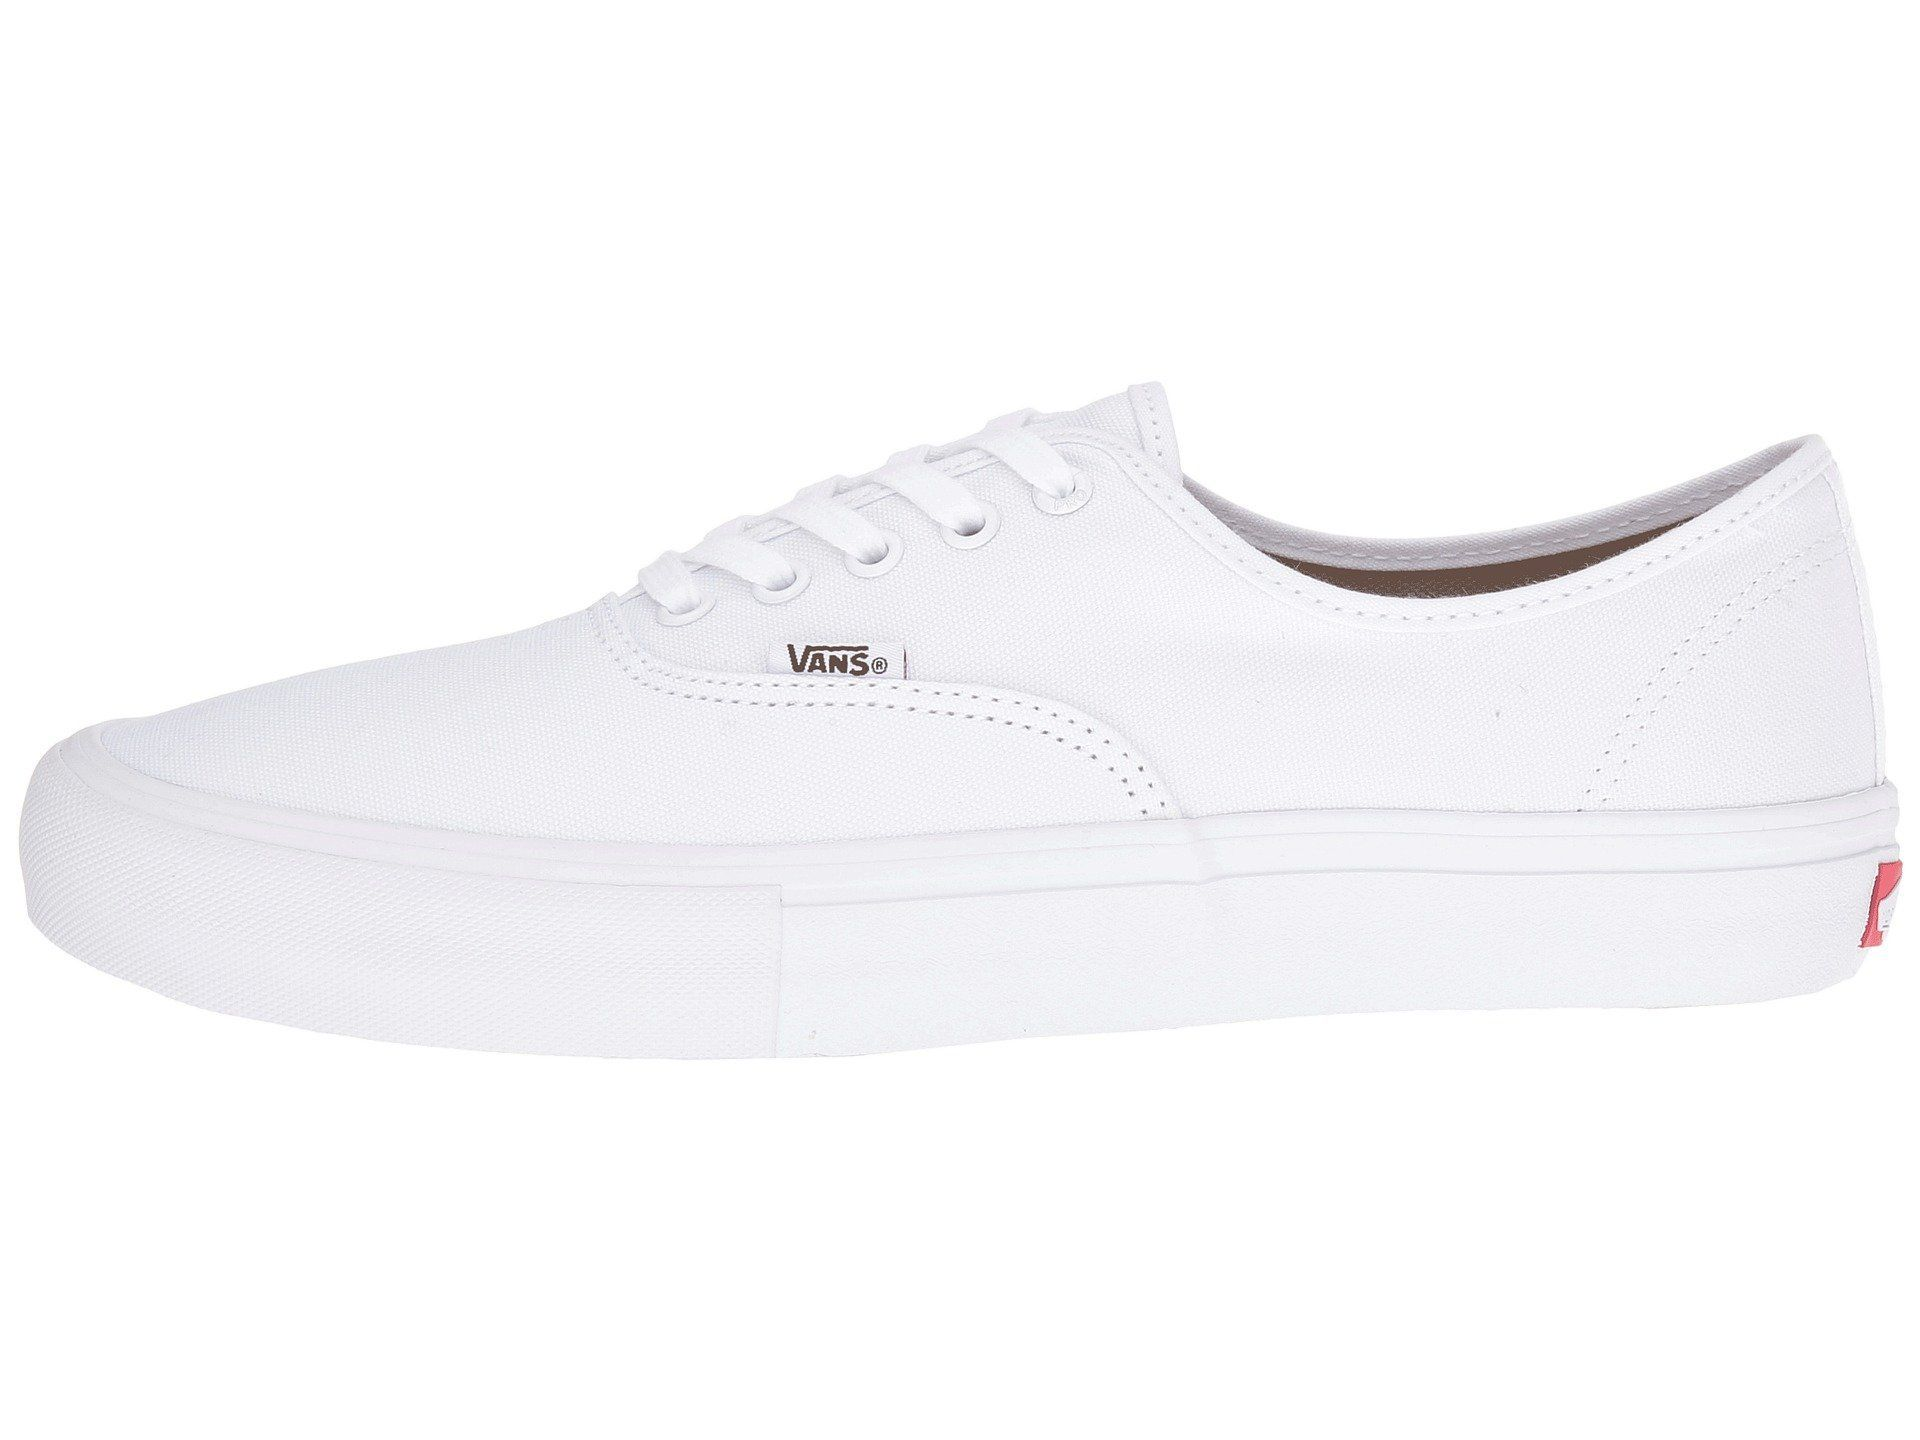 Vans-Unisex-Authentic-Skate-Women | Skate shoes, Vans, Vans ...